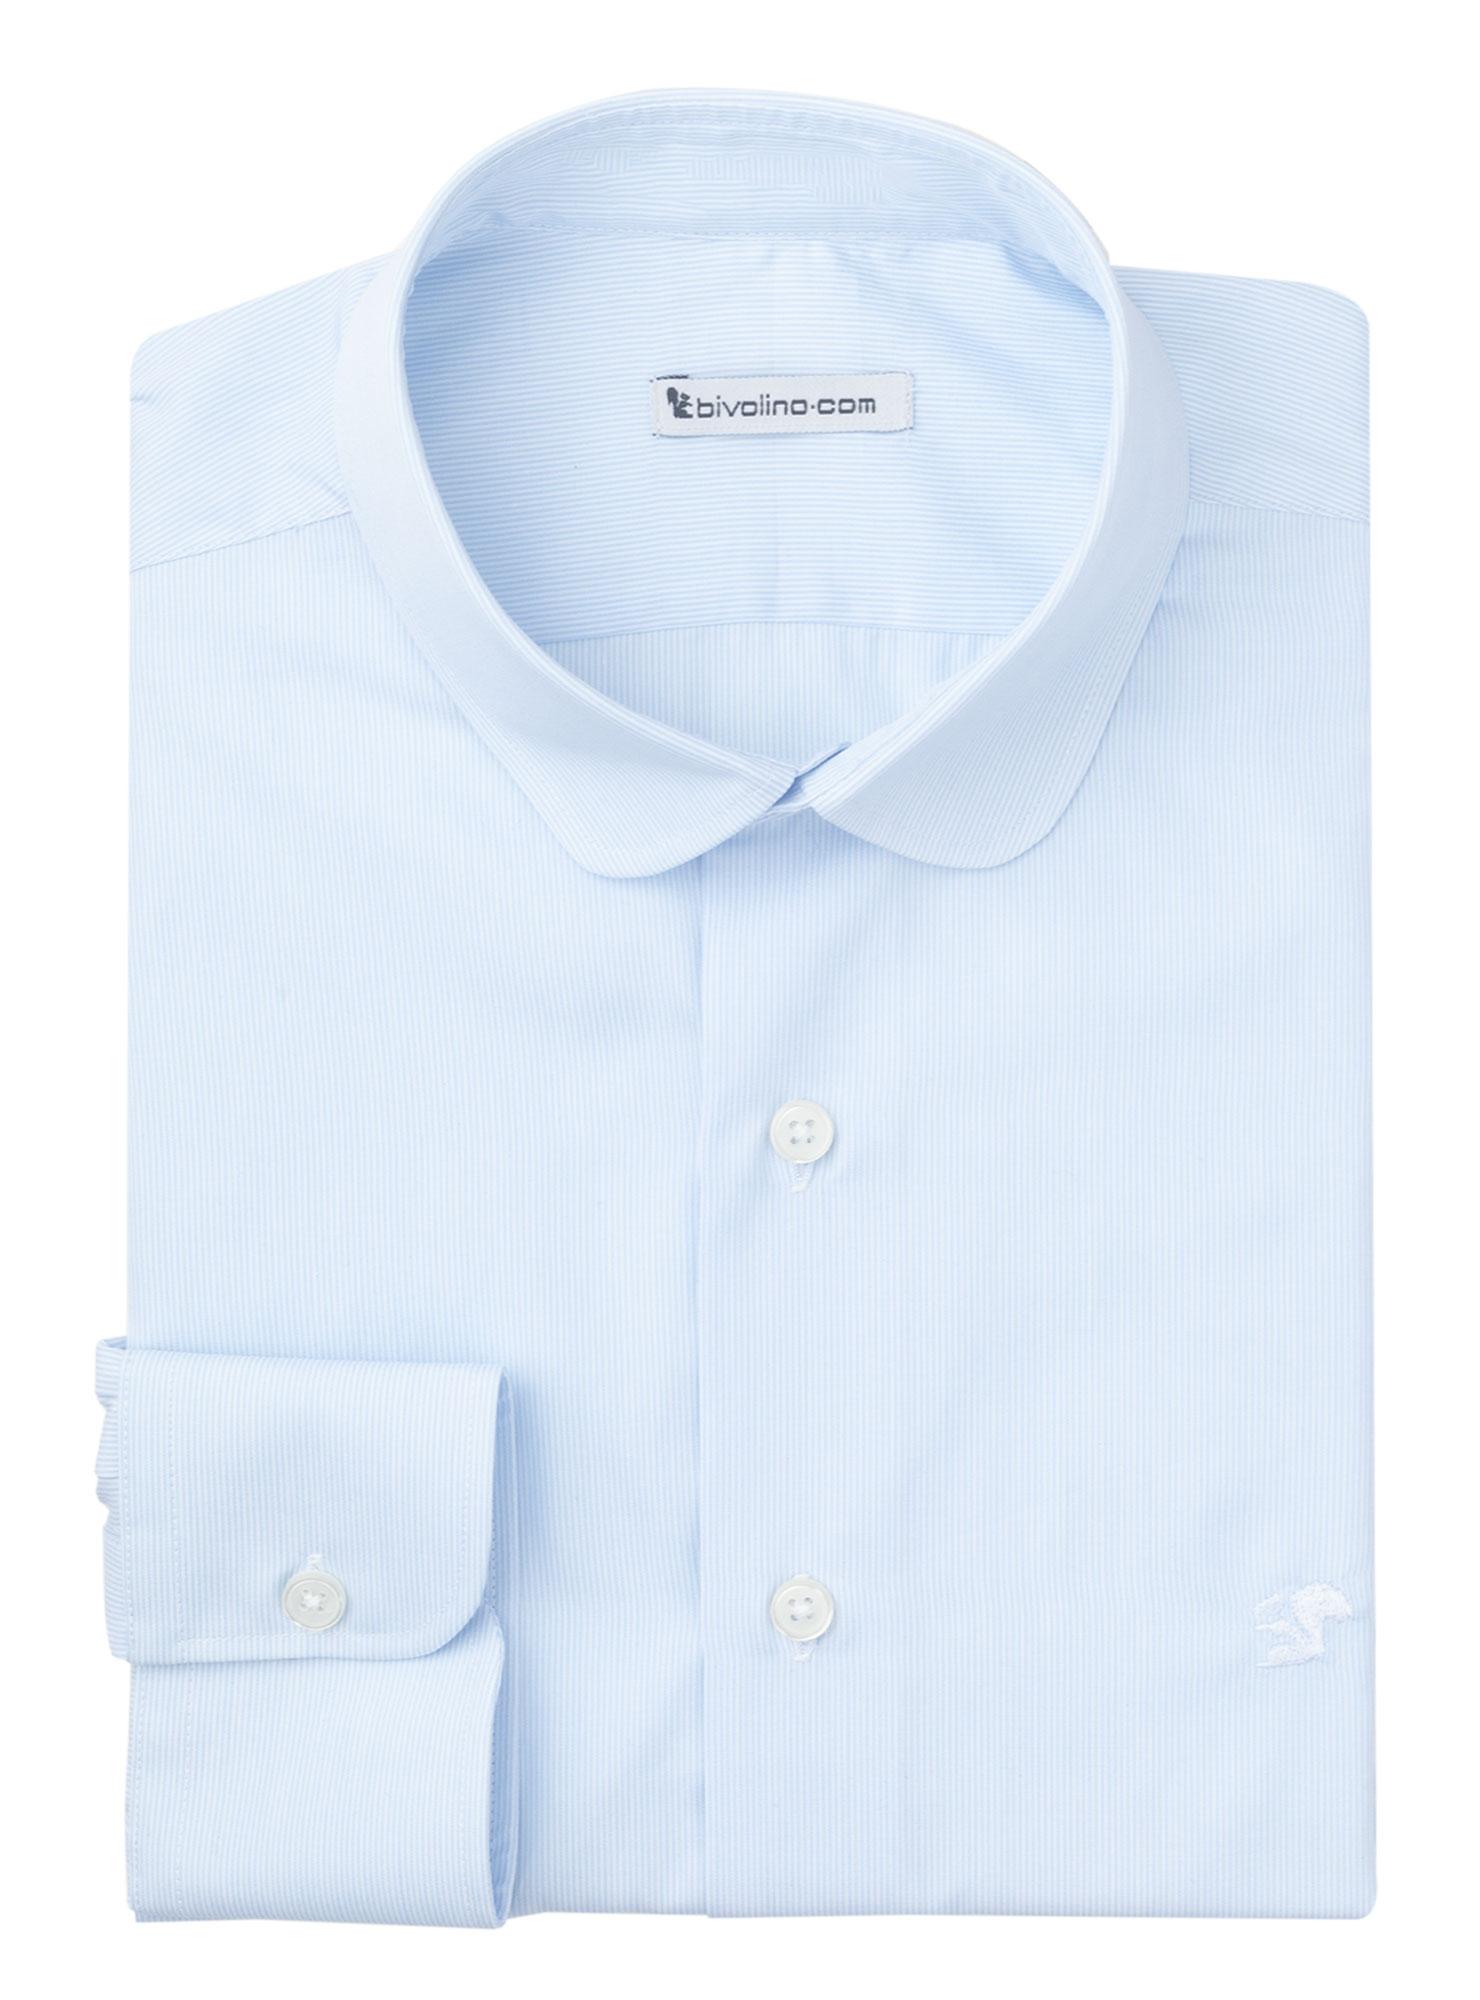 COSENZA - chemise homme Popeline Rayé Bleu Milleraie - DOCRA 6